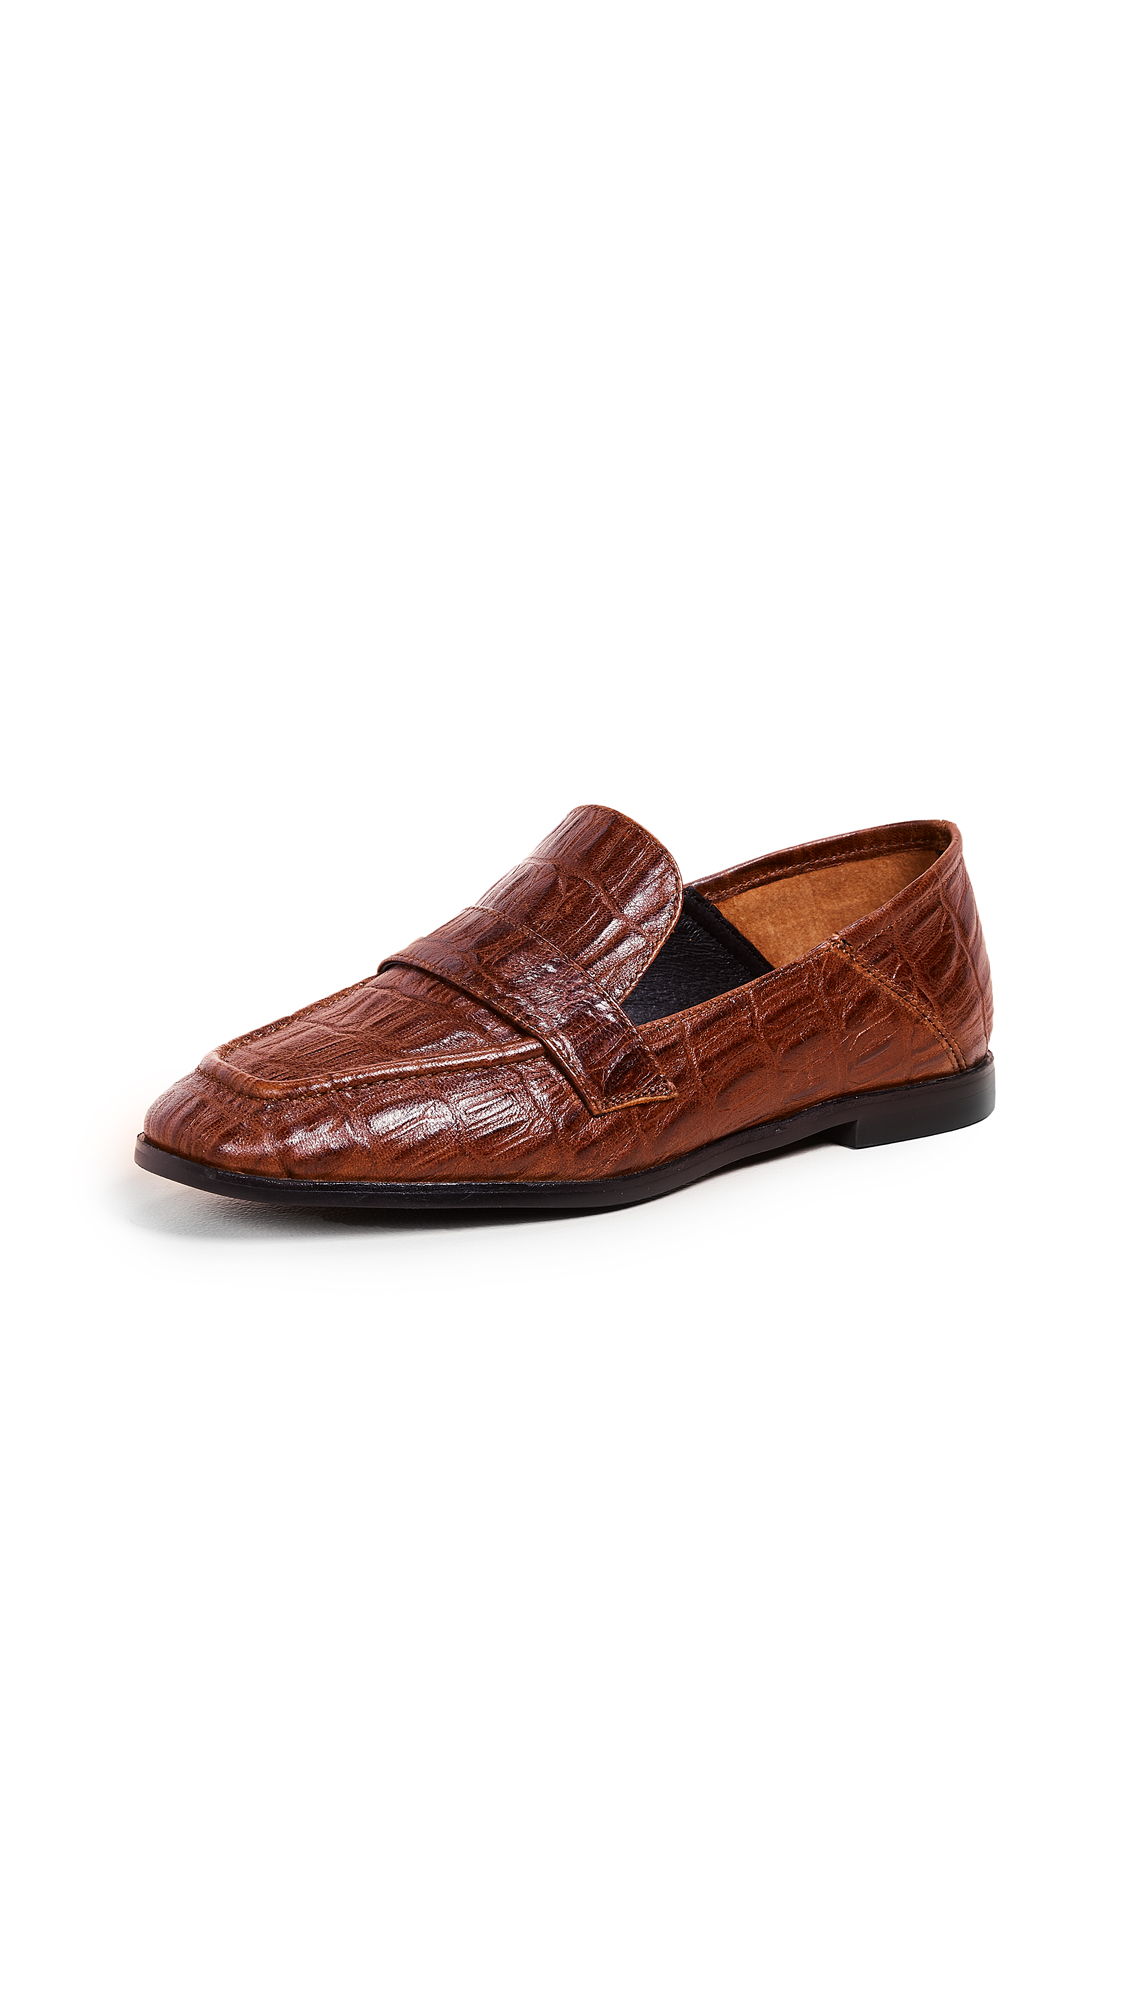 Jeffrey Campbell Jesse III Loafers - Cognac Croco